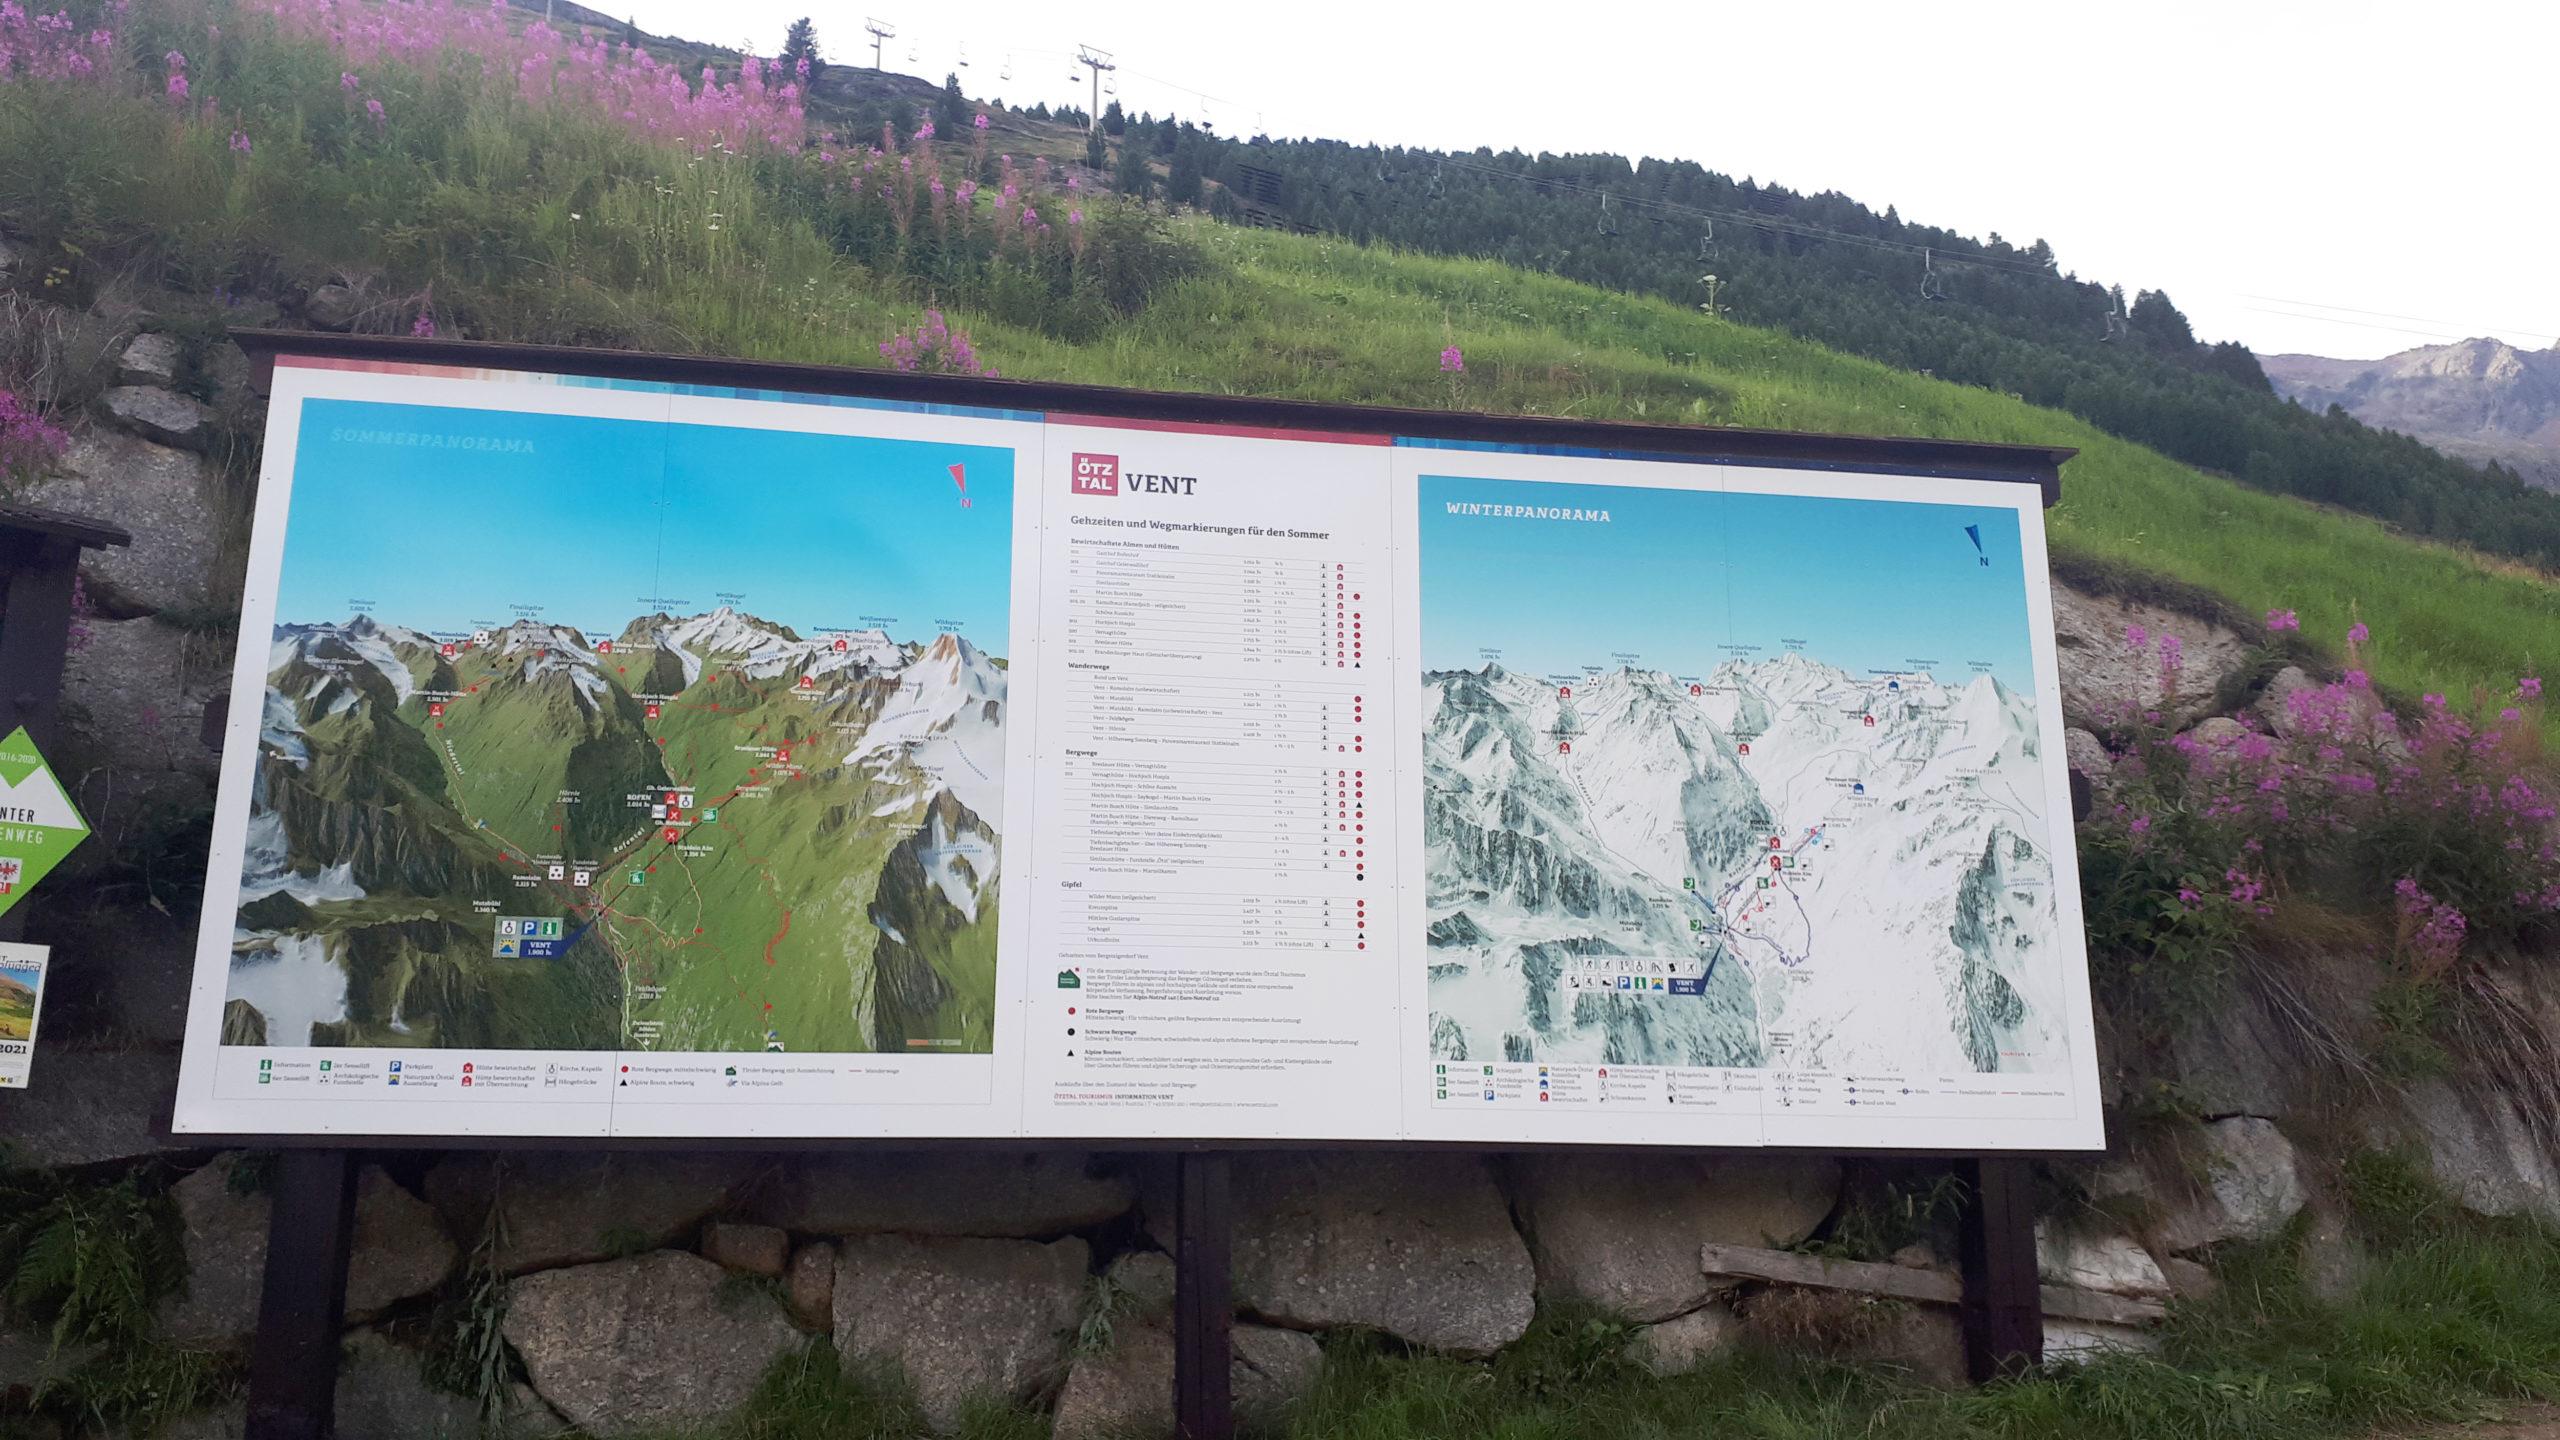 3D Panoramakarte - Panoramatafel - Vent Ötztal - Sommer & Winter